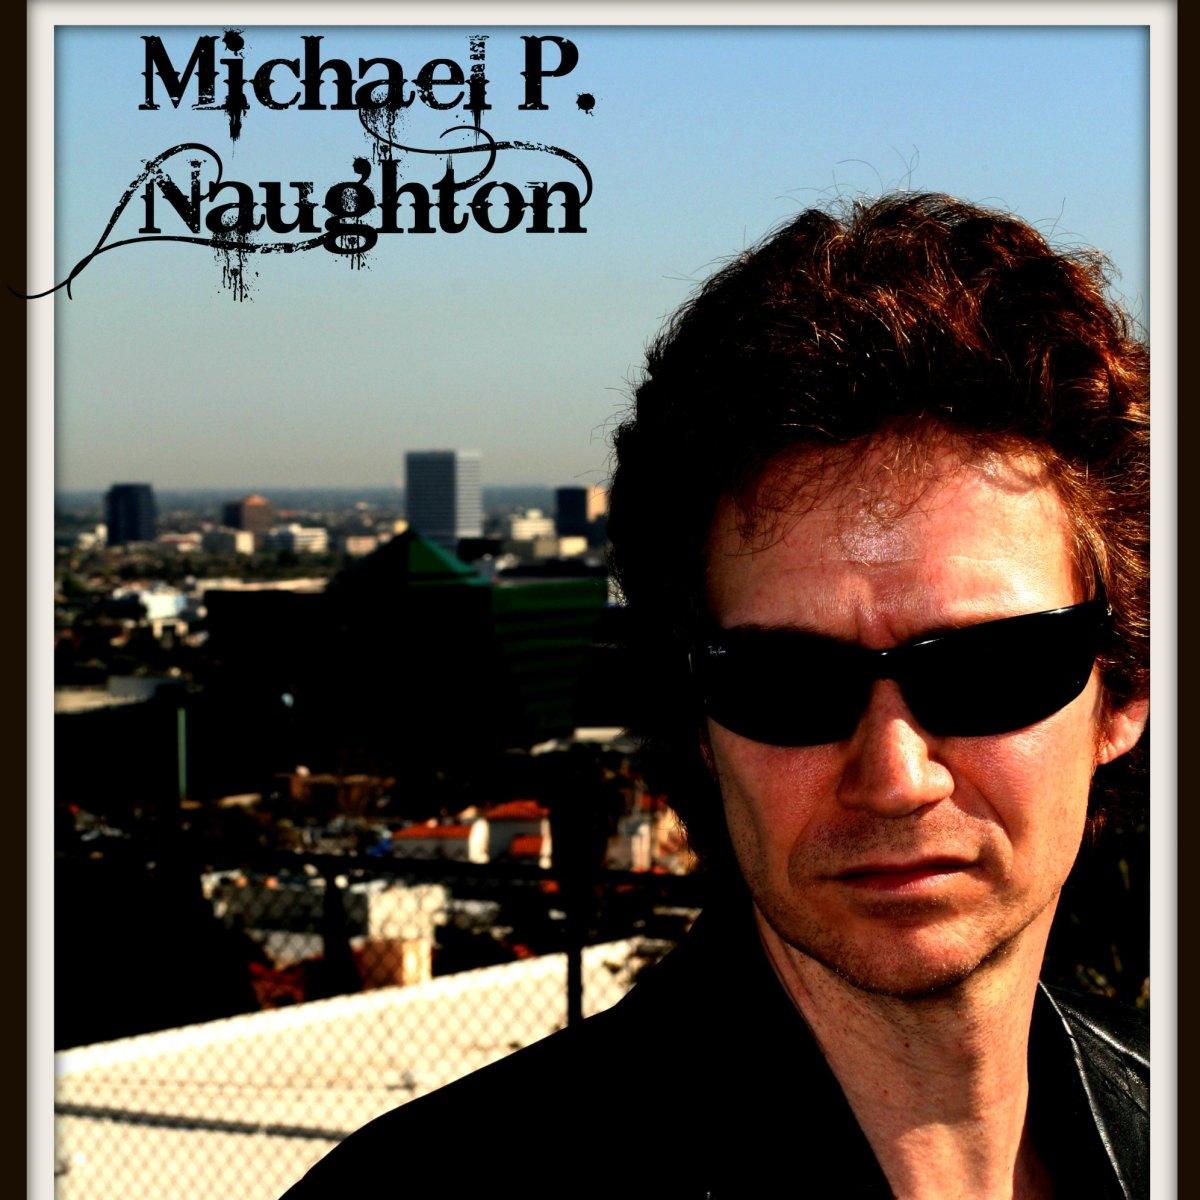 Michael P. Naughton